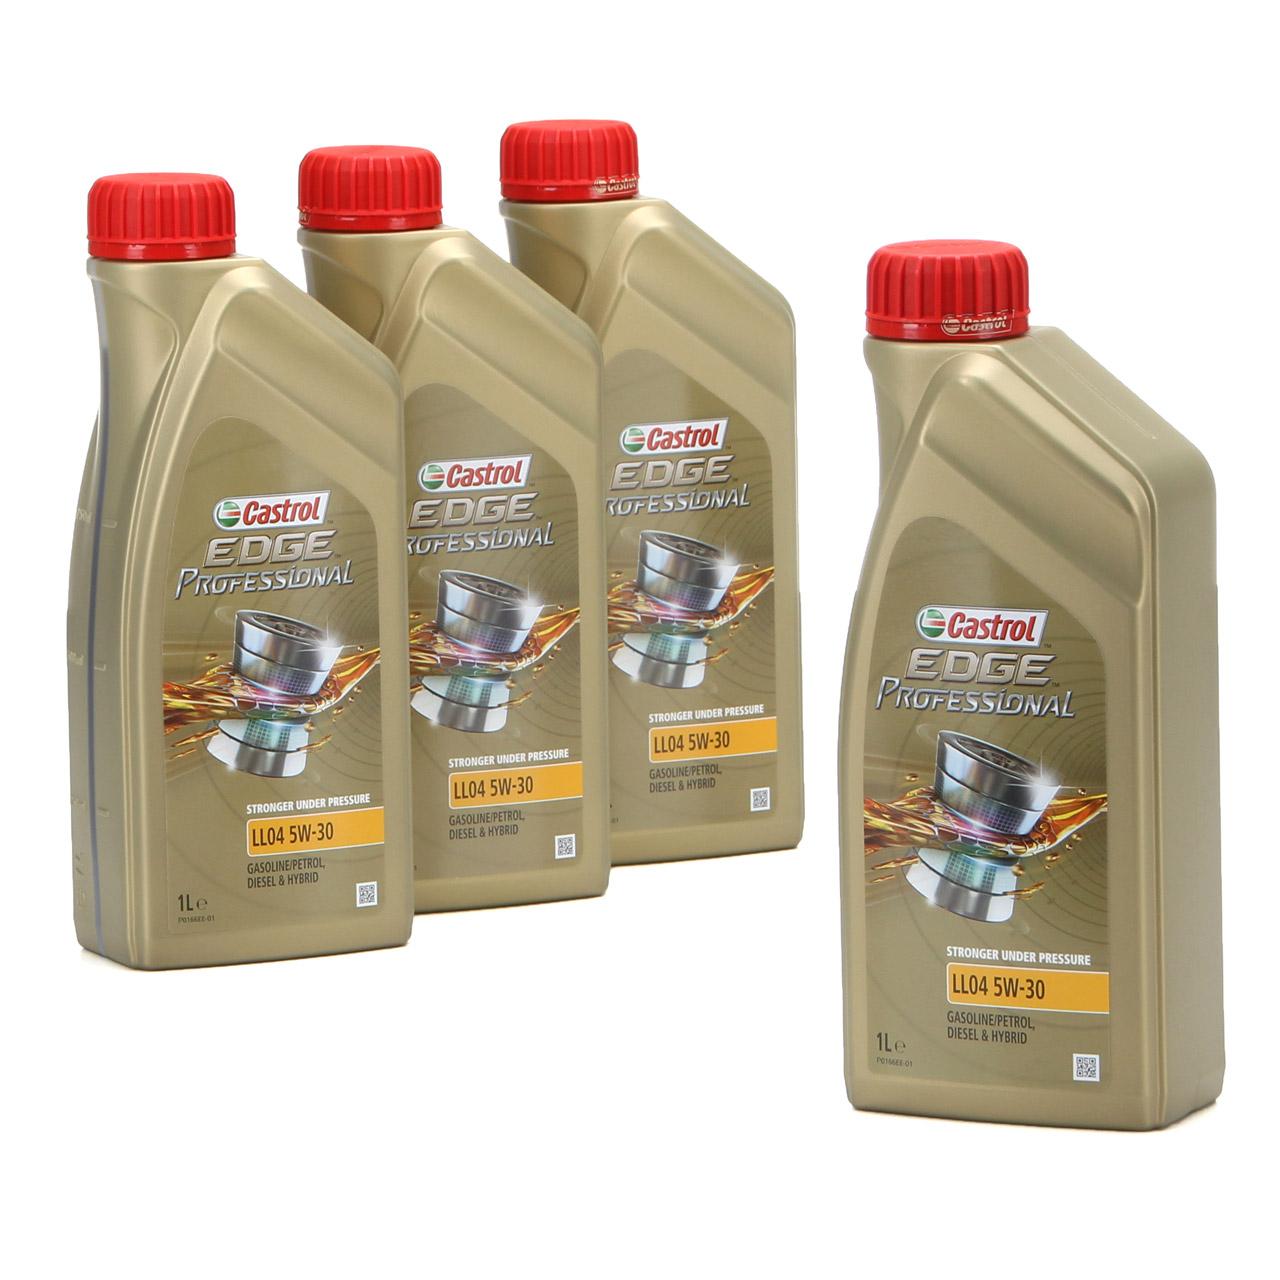 CASTROL EDGE Professional Motoröl Öl für BMW Longlife IV LL04 5W-30 - 4 Liter